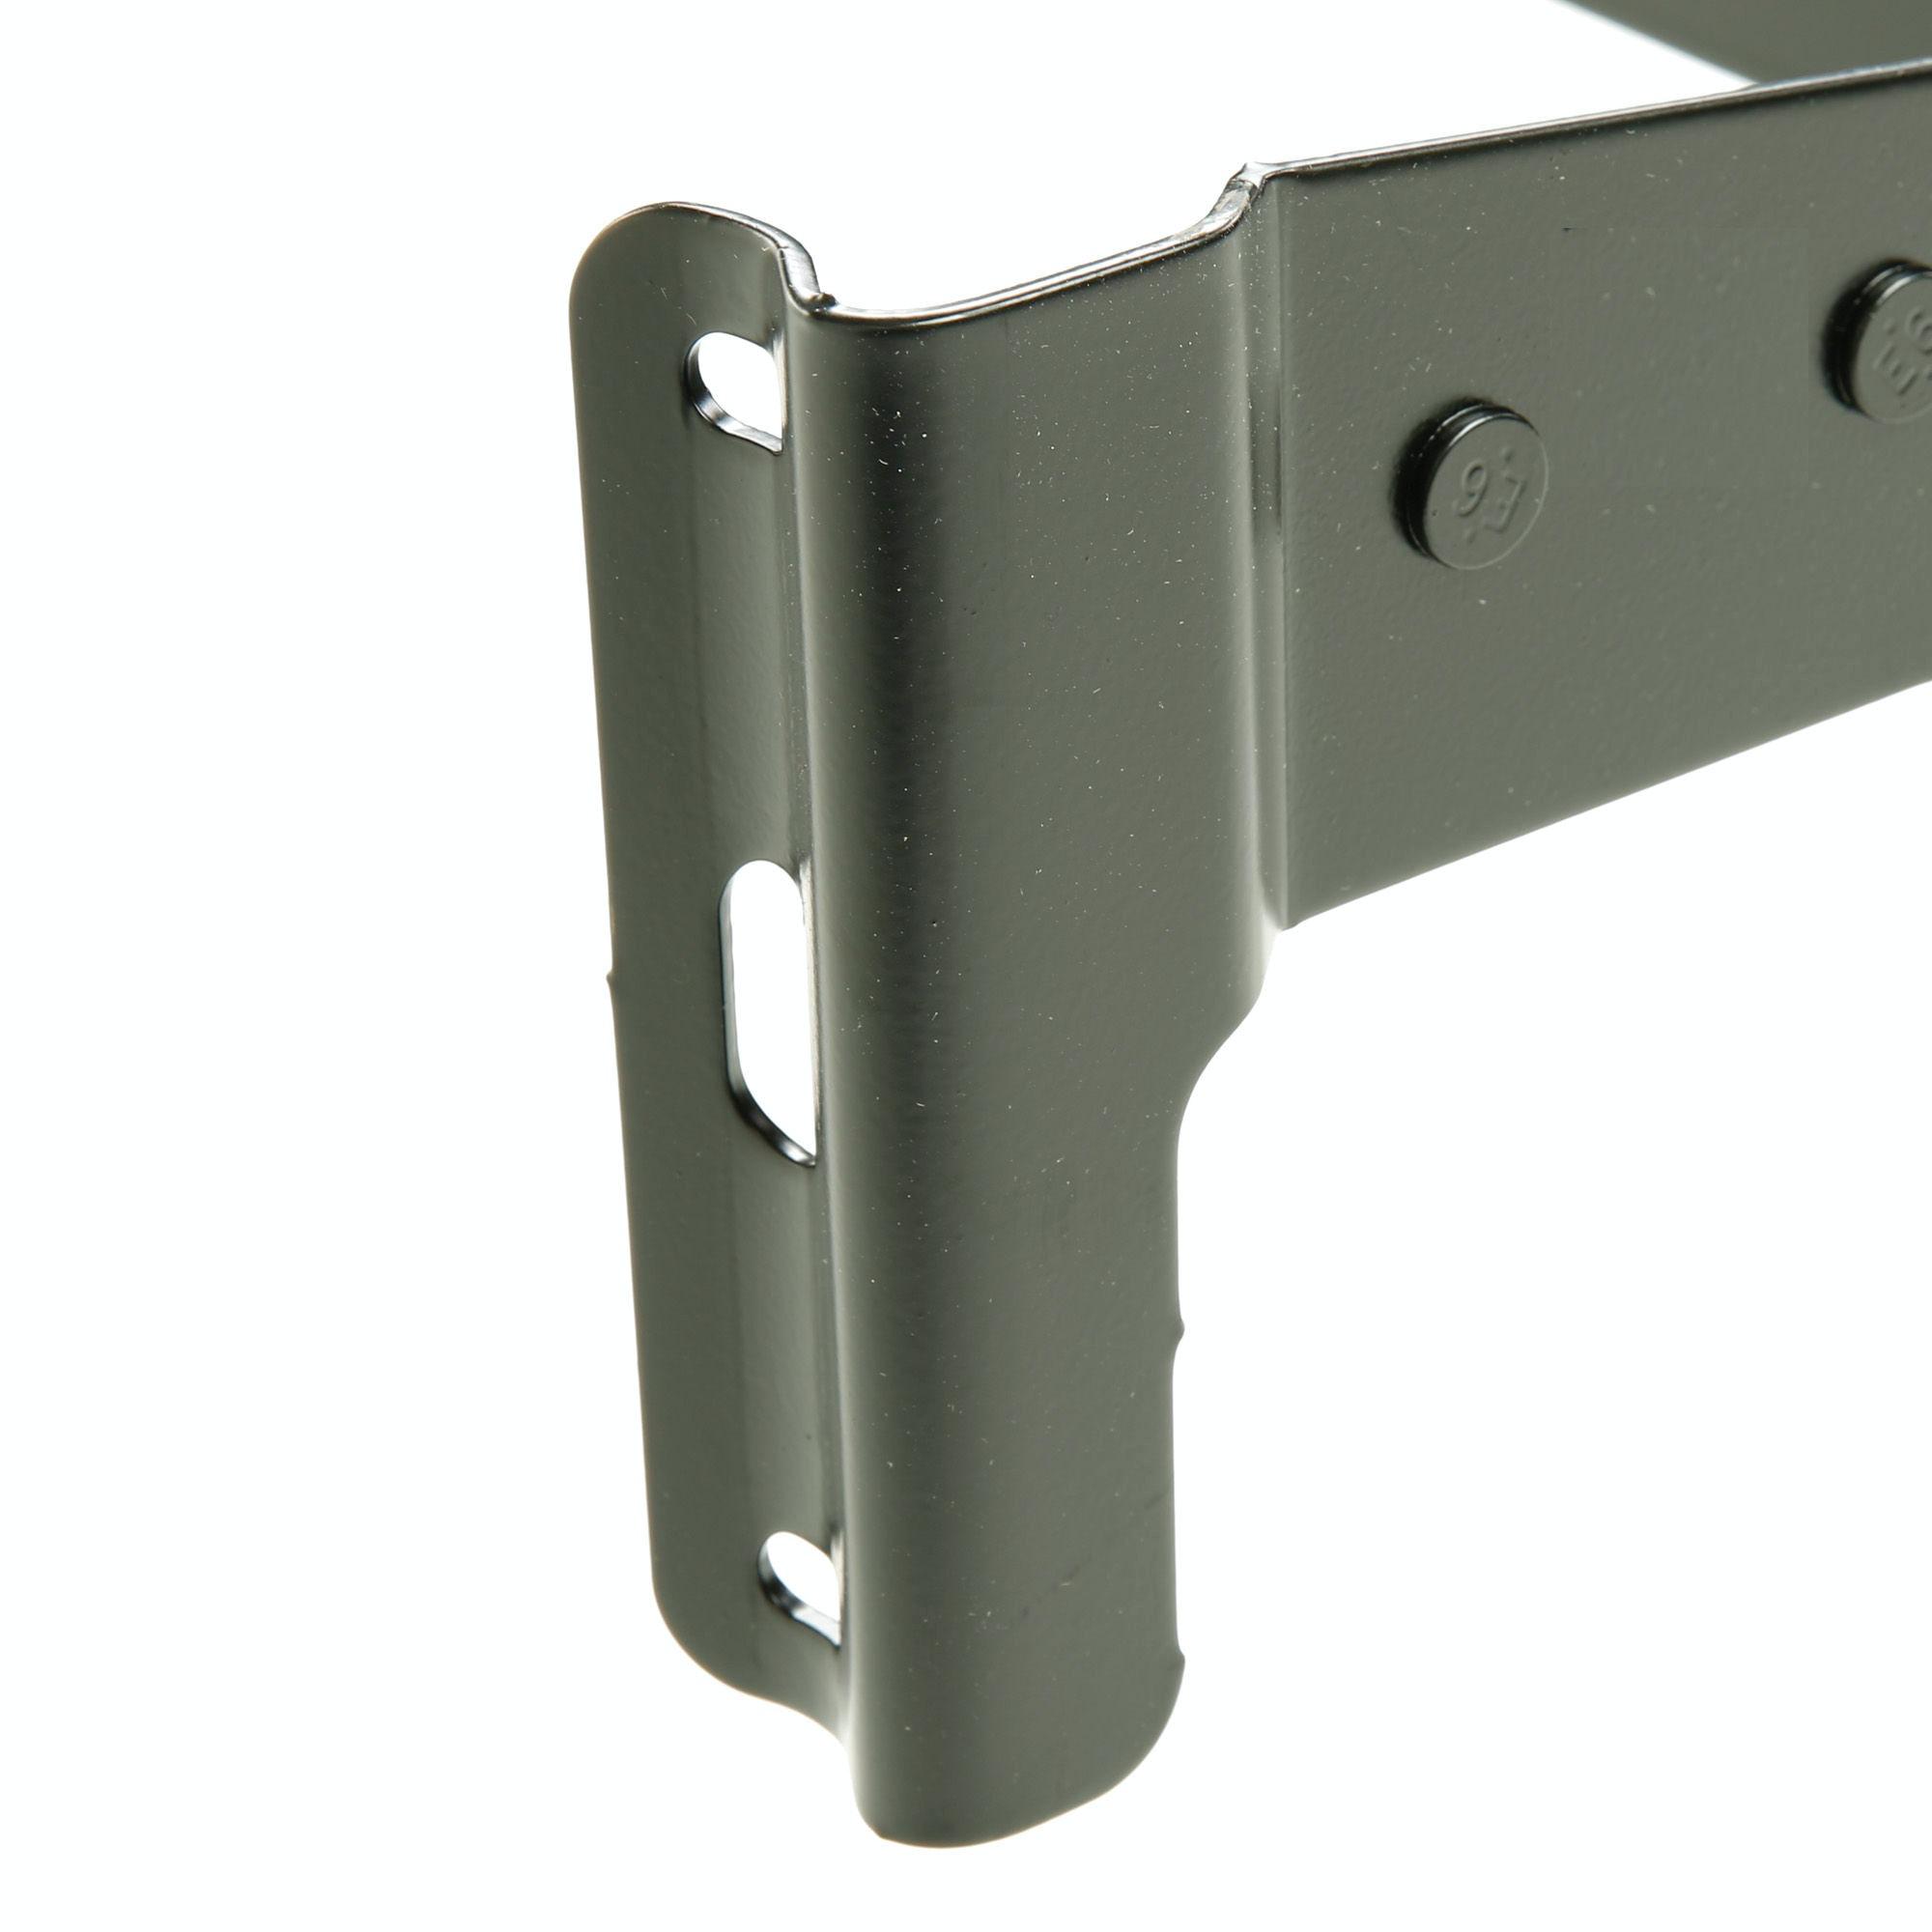 Fashion Bed Group Mattresses Engineered Adjustable 834 Bed Frame